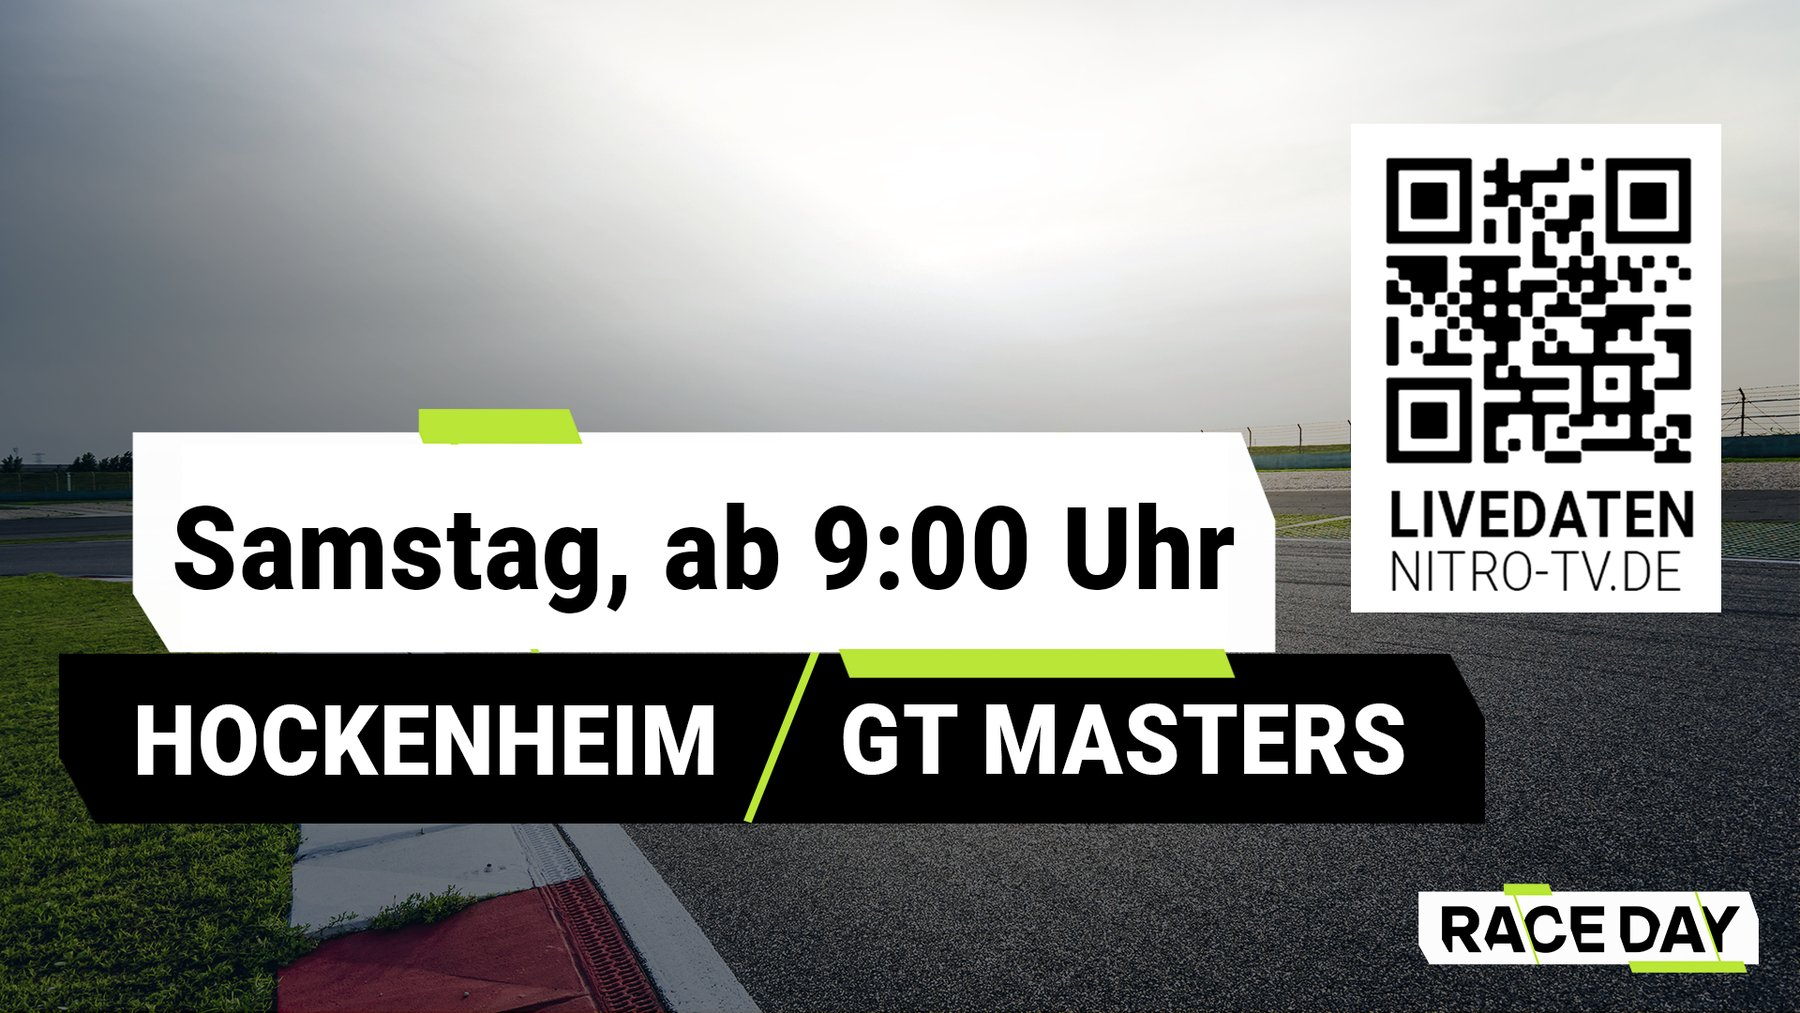 Hockenheim - GT Masters - Samstag